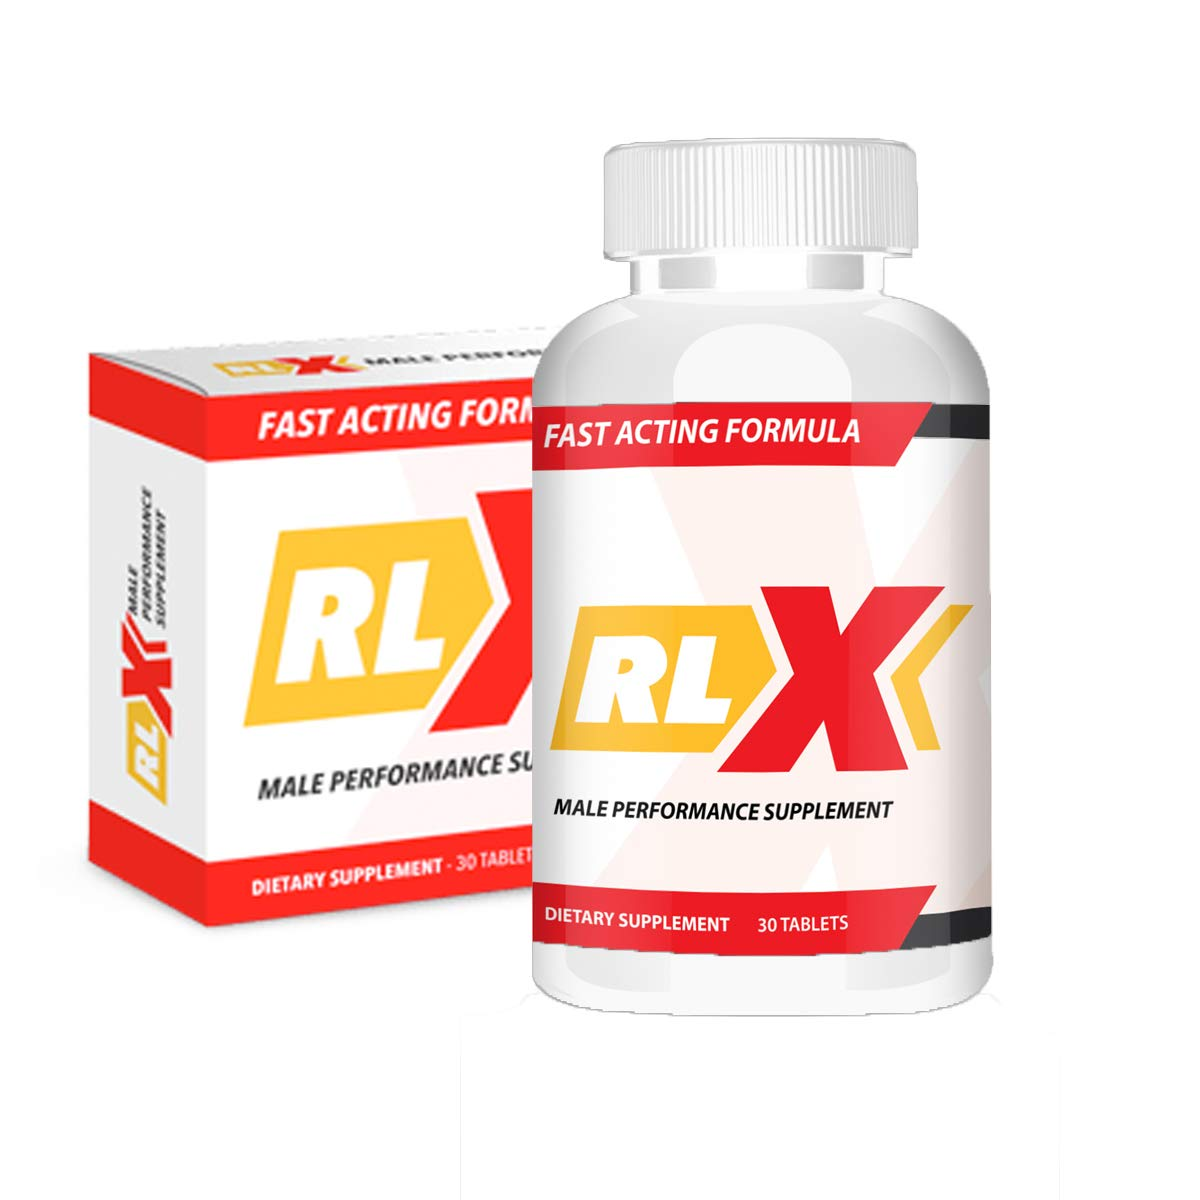 RLX Pills Male Performance